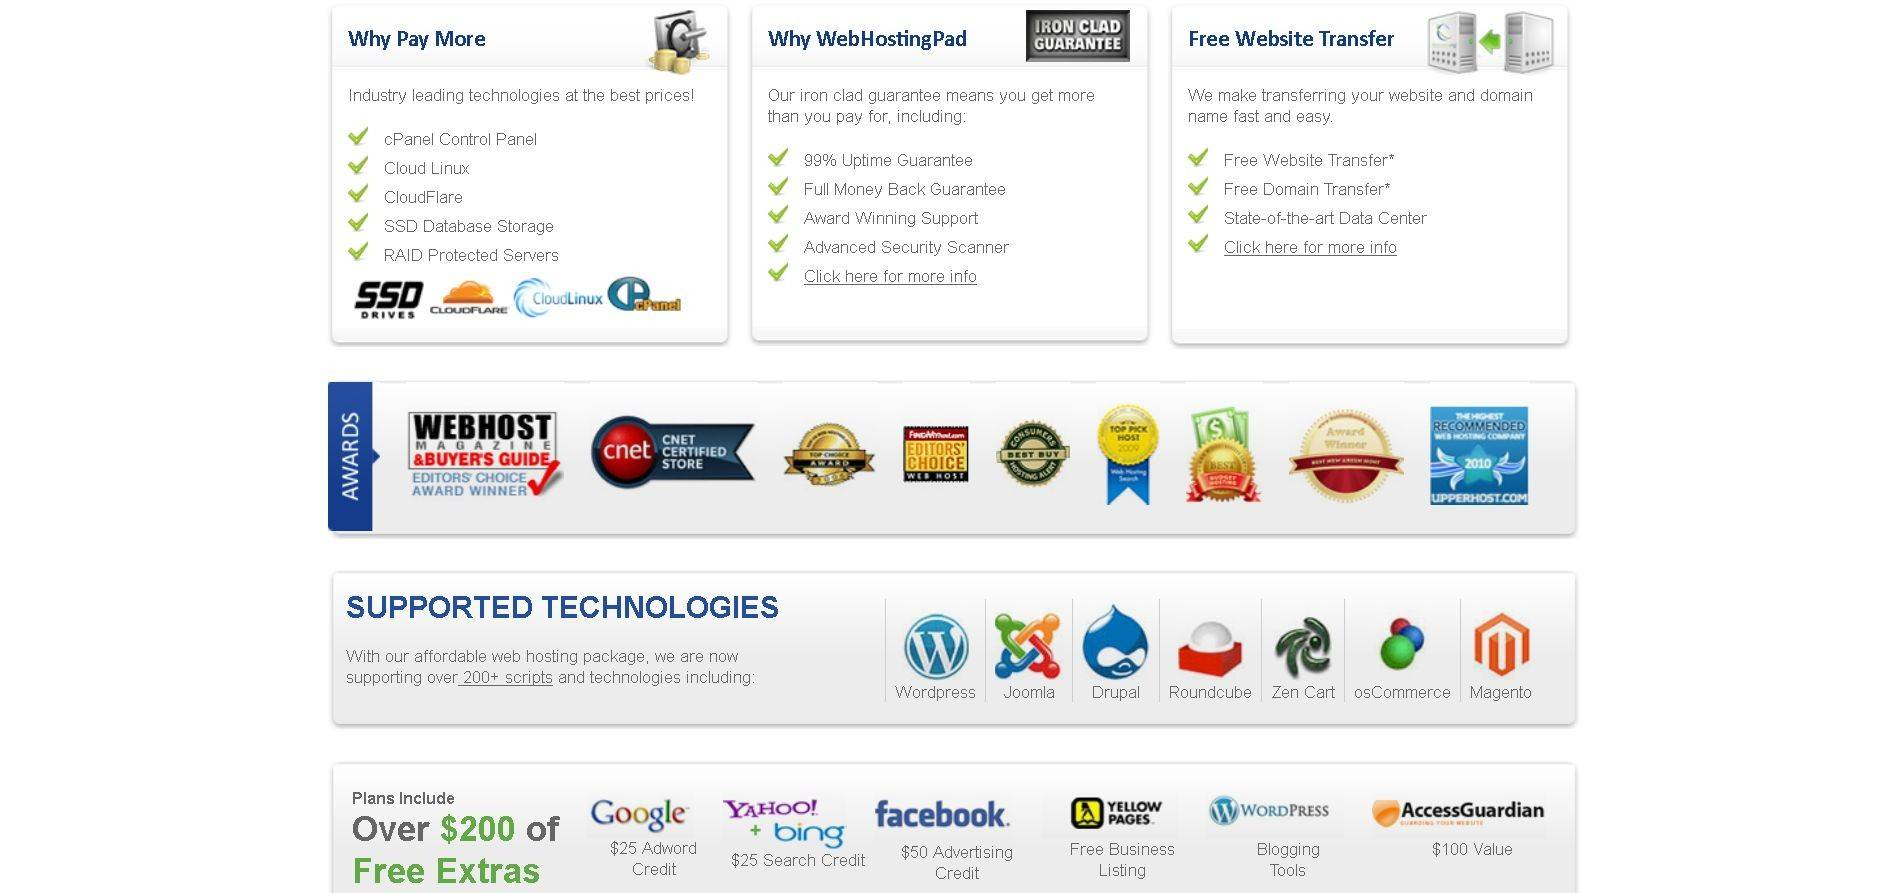 Gallery - WebHostingPad Review